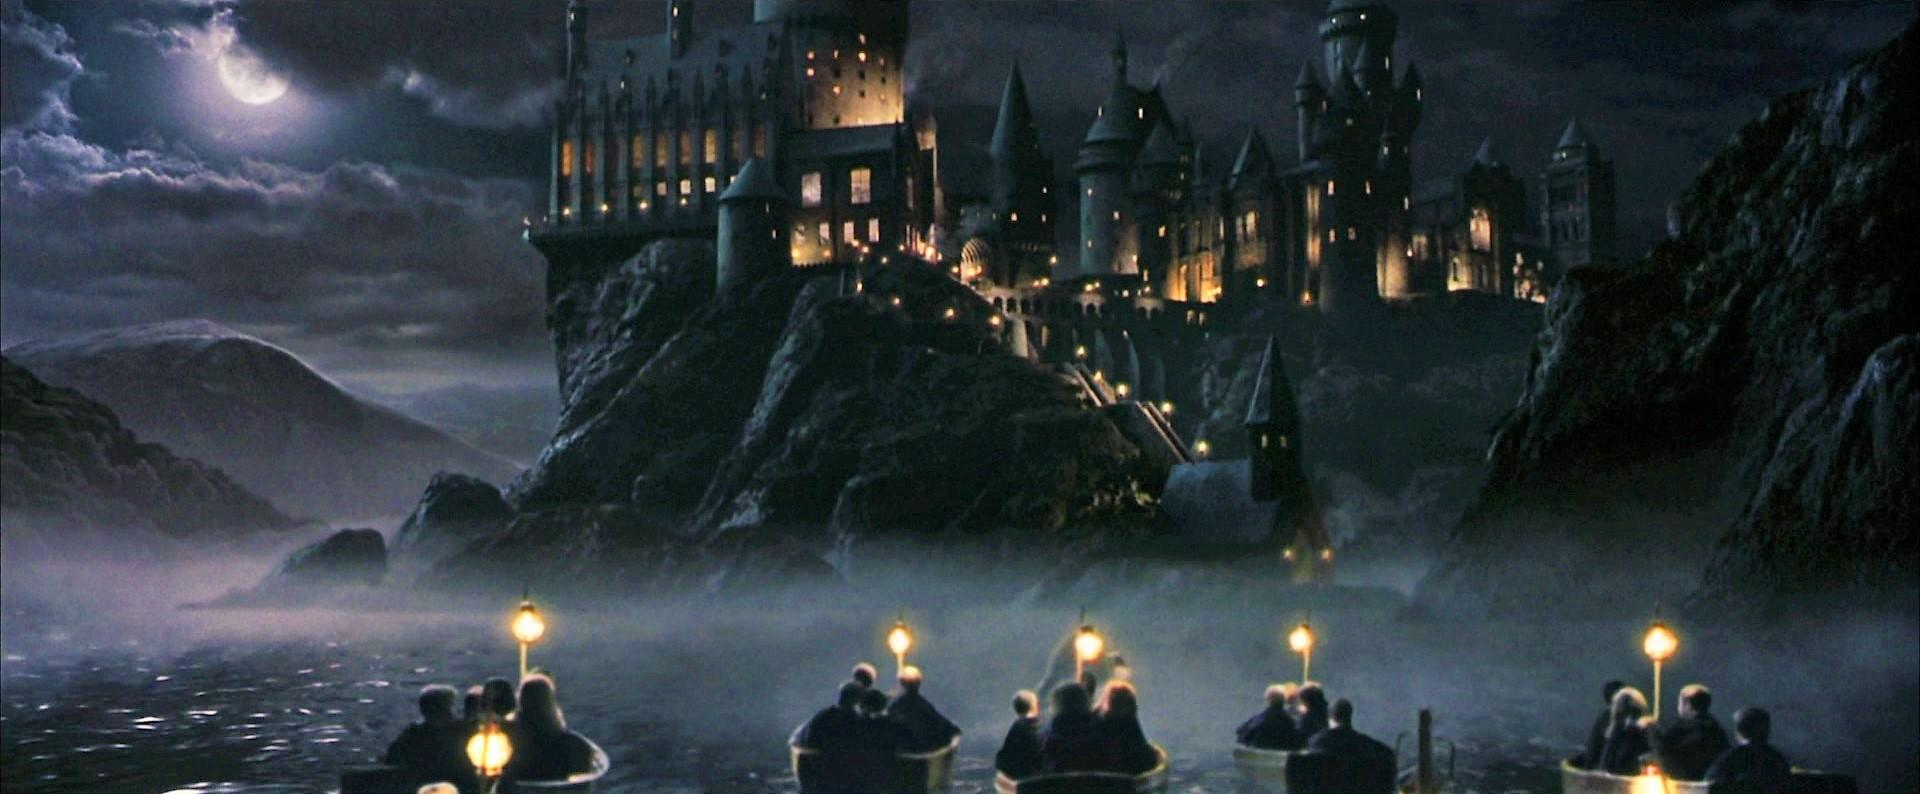 Image Hogwarts Boats 1 Jpg Harry Potter Wiki Fandom